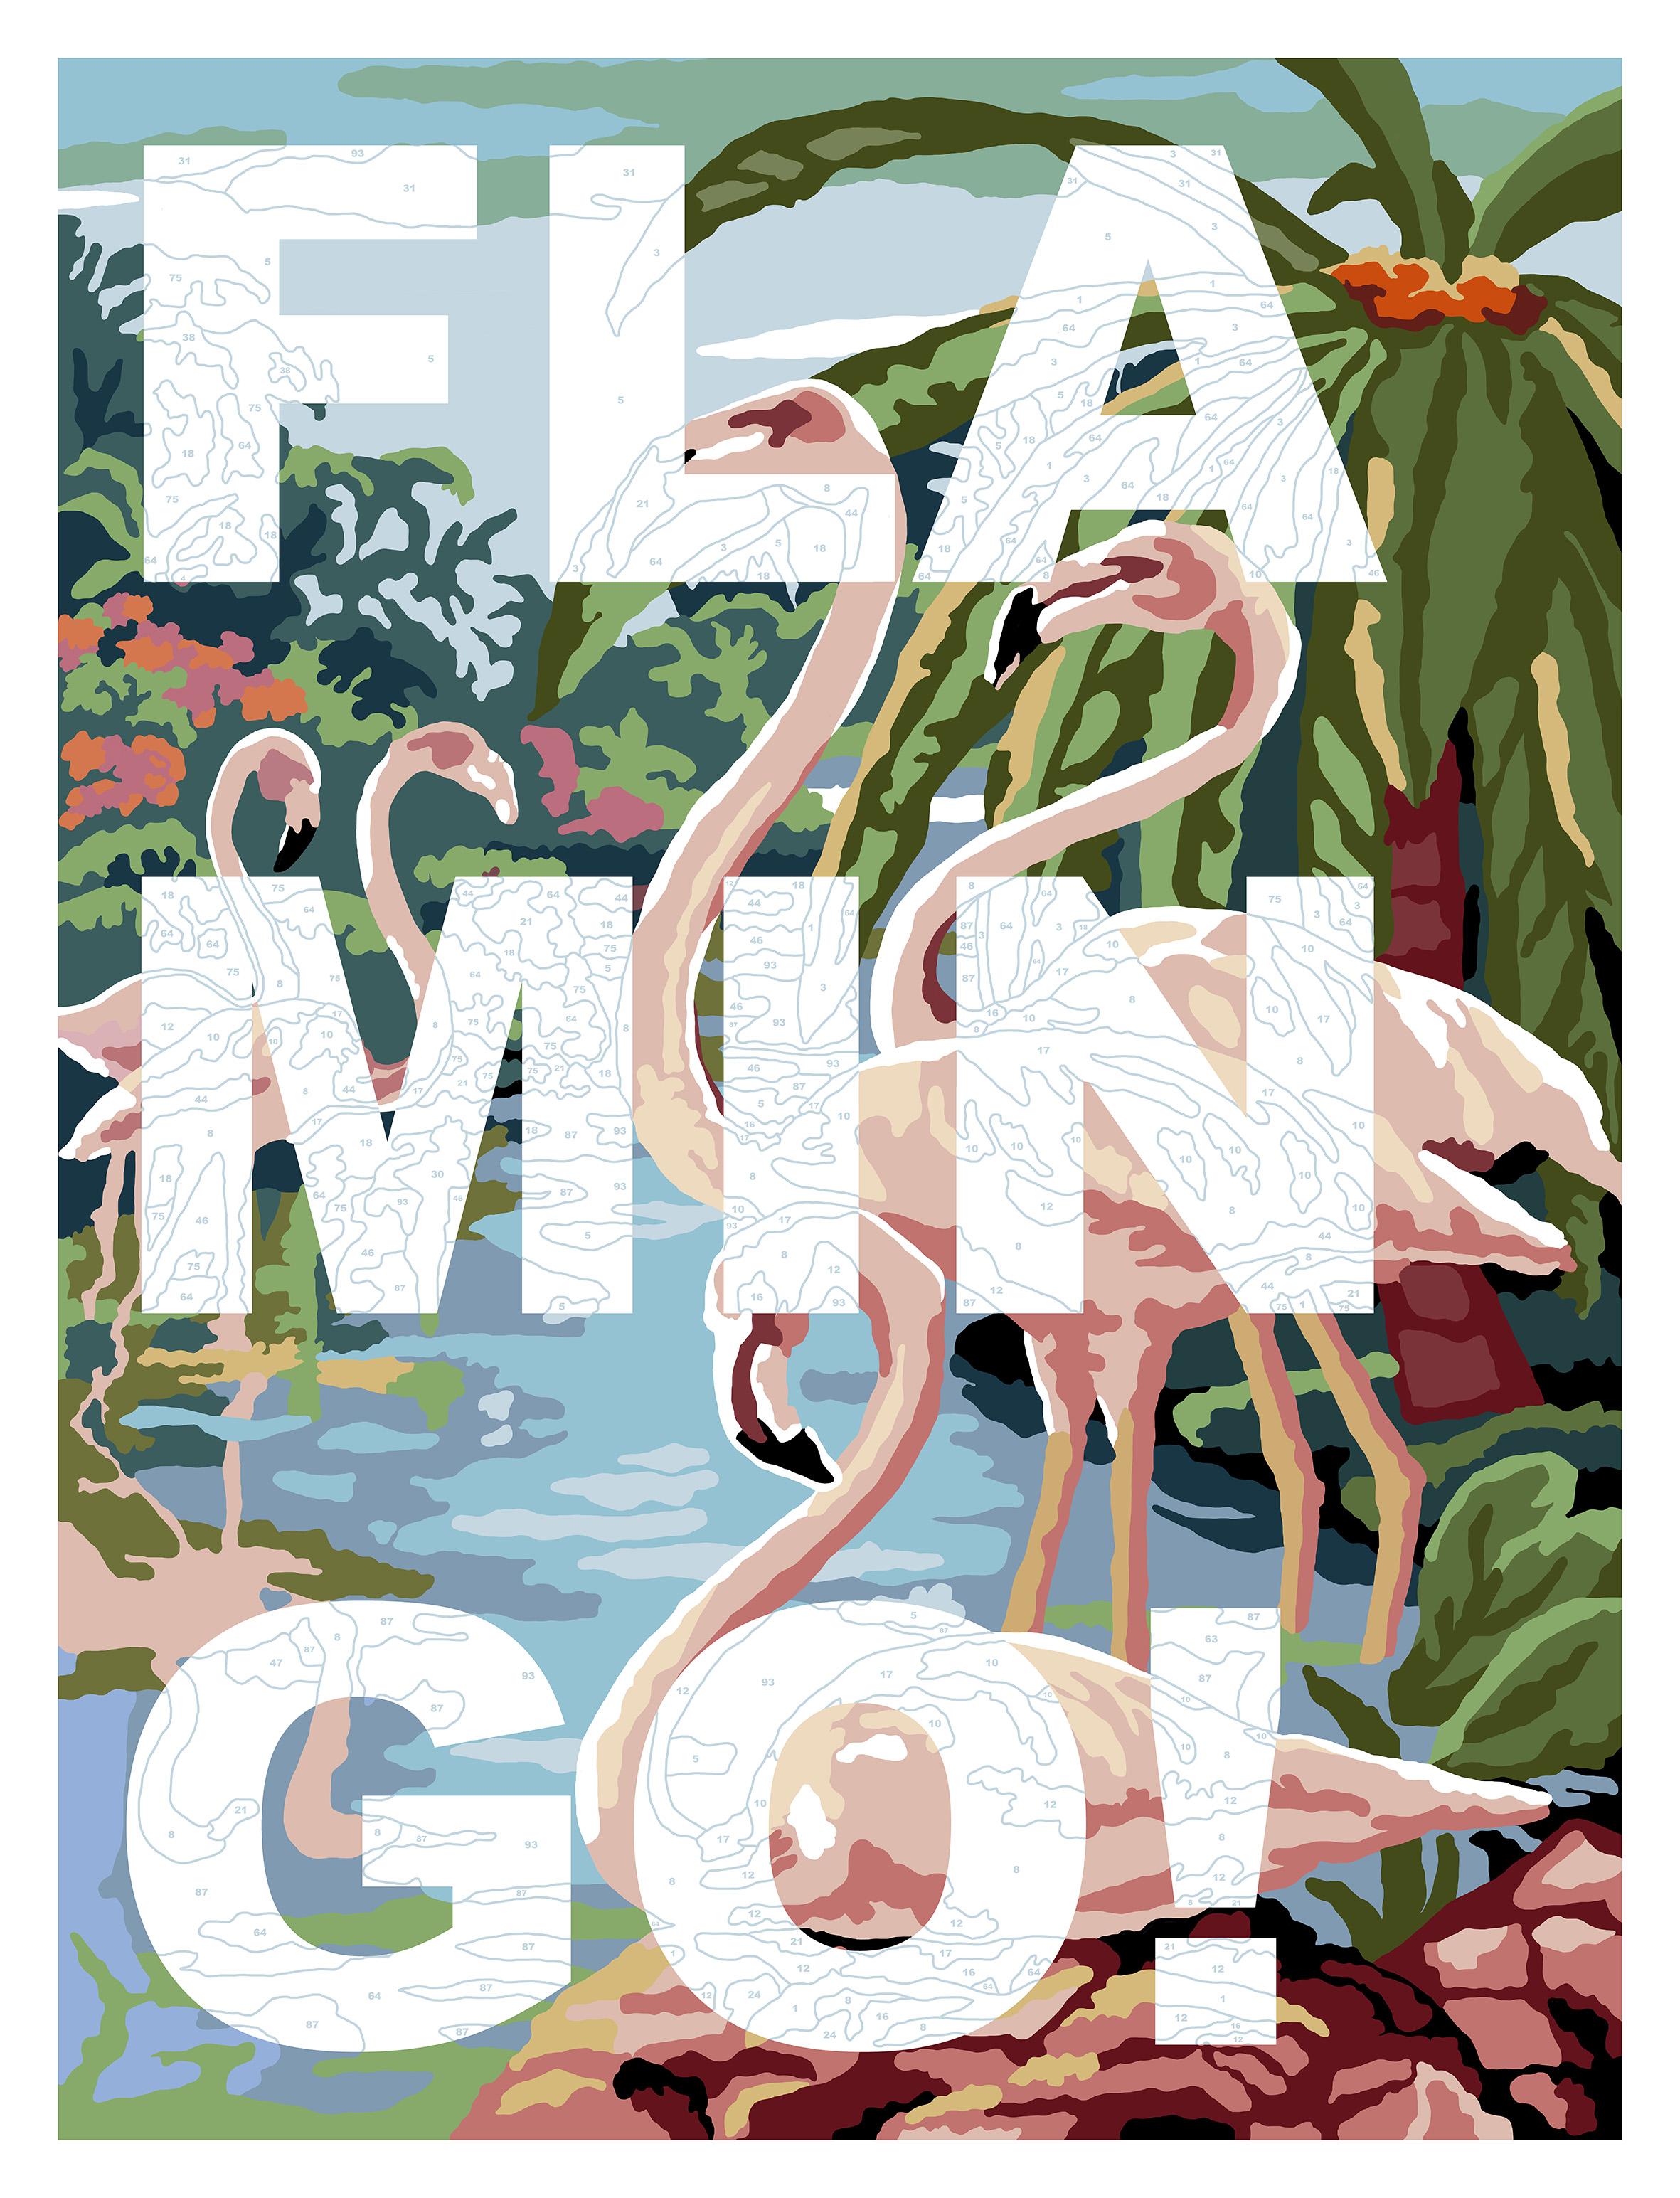 Flamingo!   Enamel gloss paint on canvas  100 x 130 cm  2017  SOLD